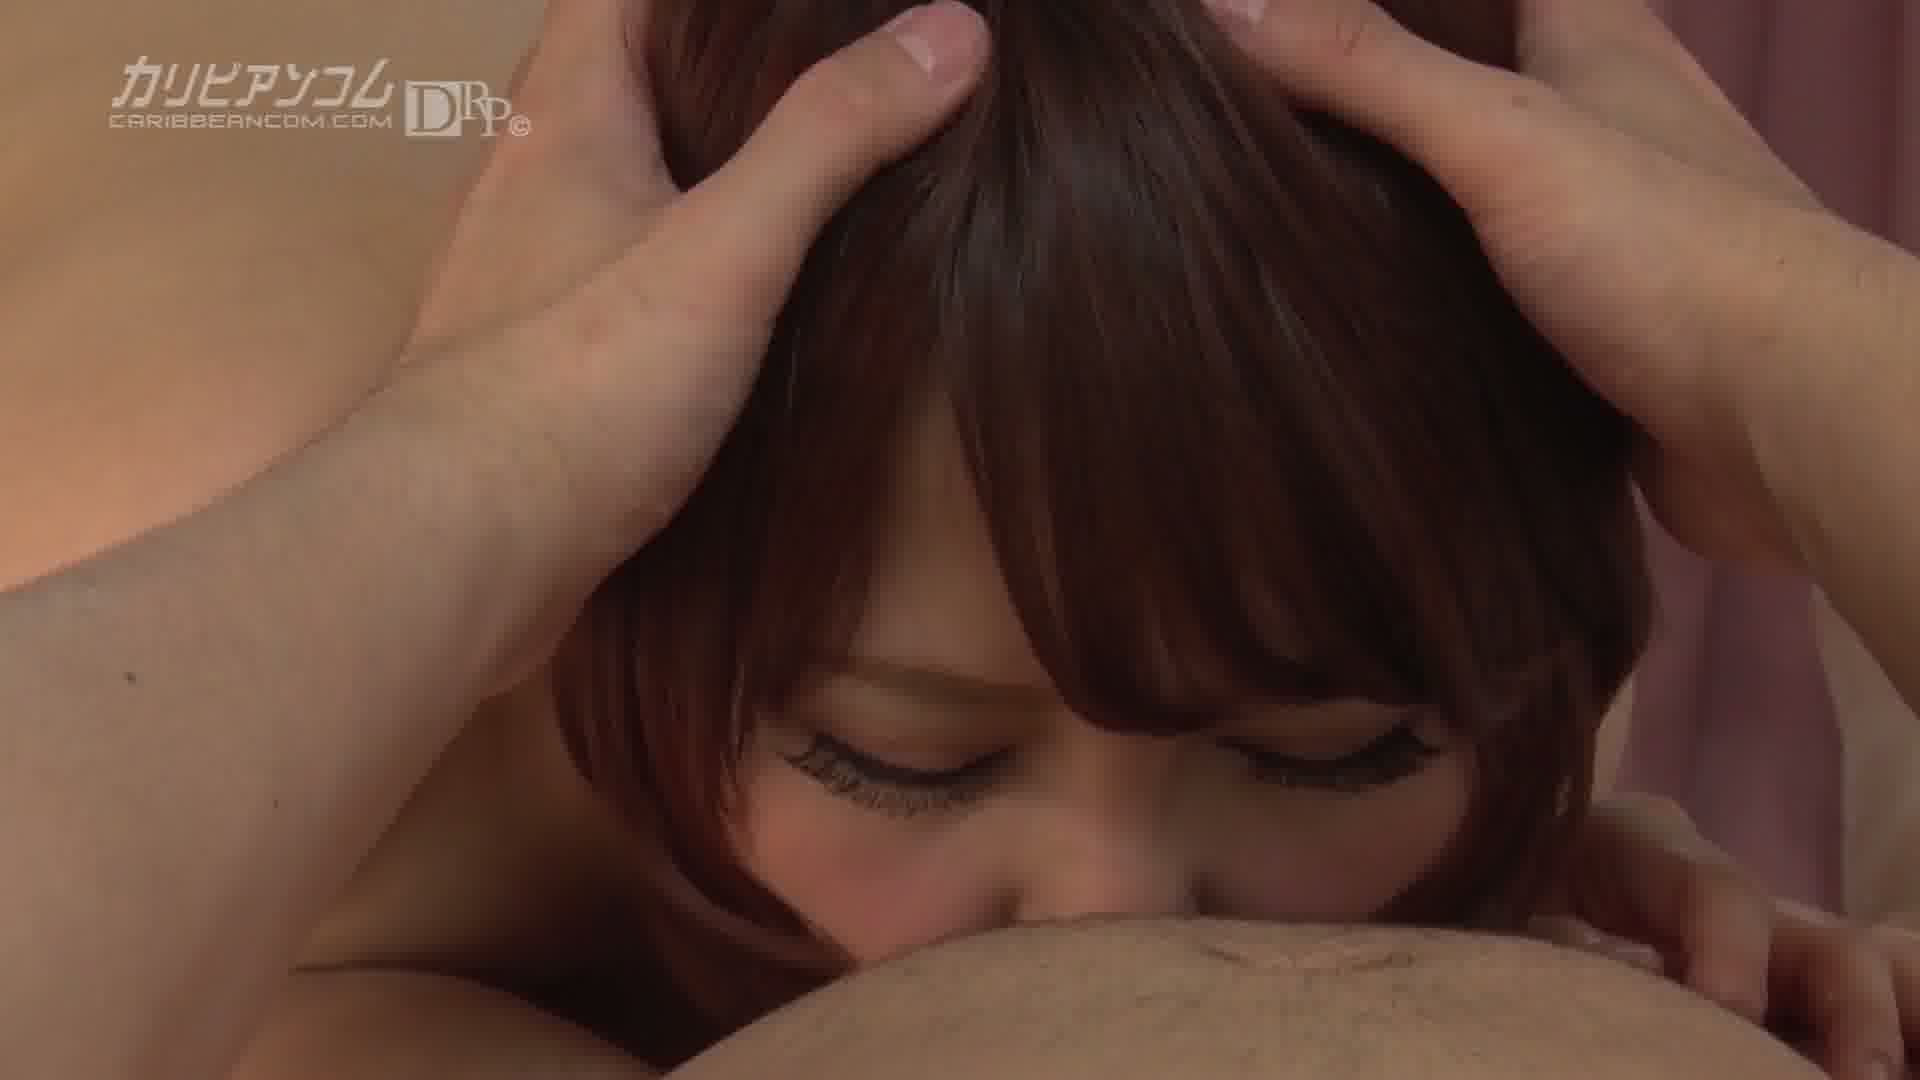 THE 未公開 〜喉オナホ3〜 - 双葉みお【美乳・美尻・イラマチオ】